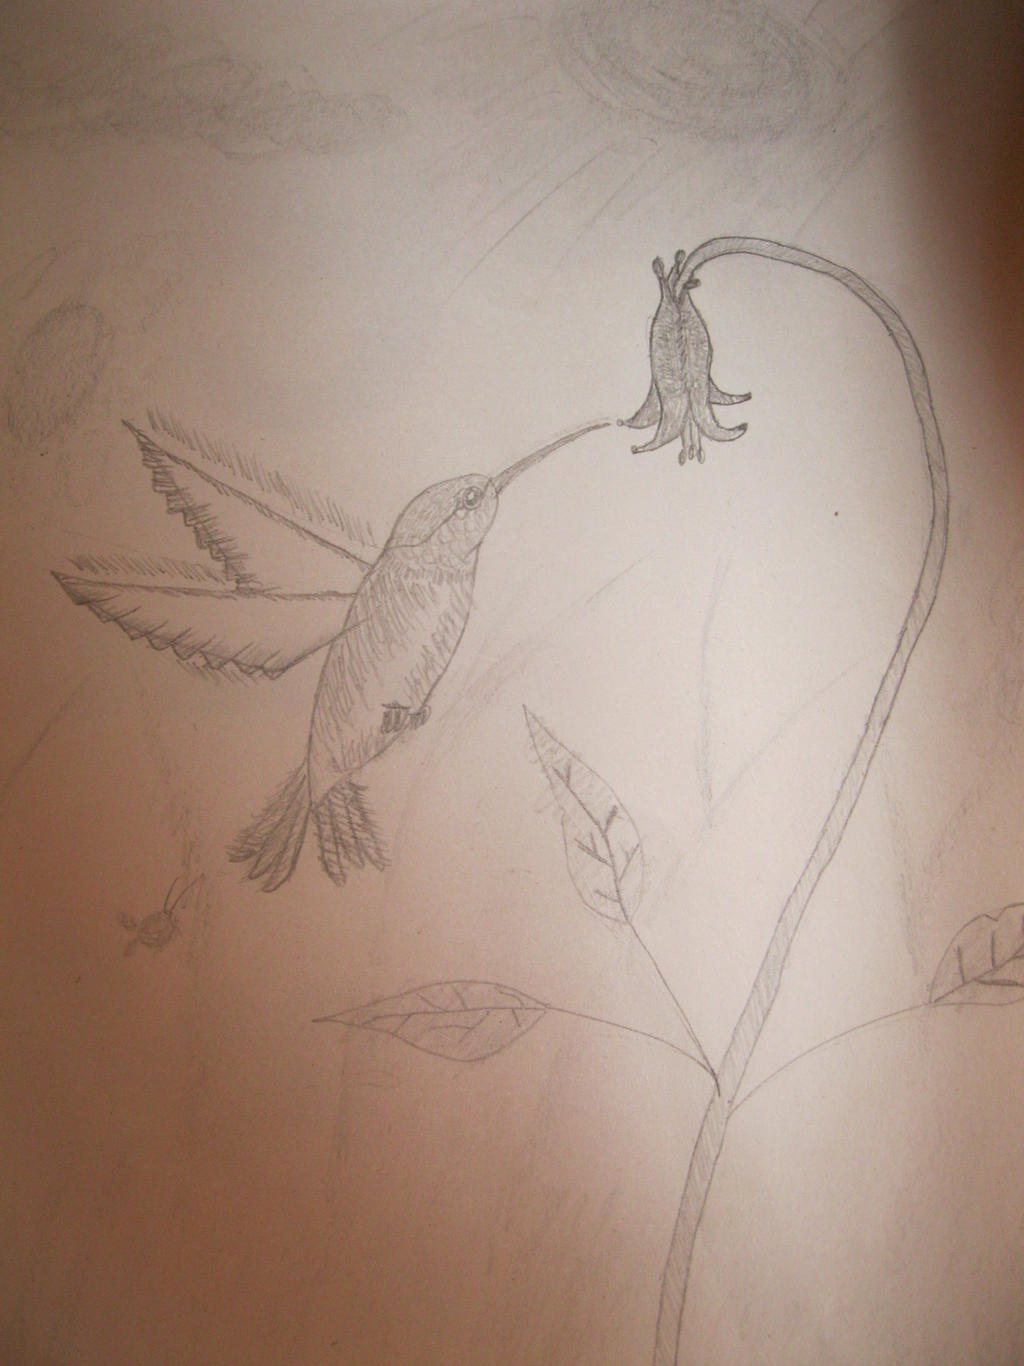 Pin Hummingbird Flower Gallery on Pinterest